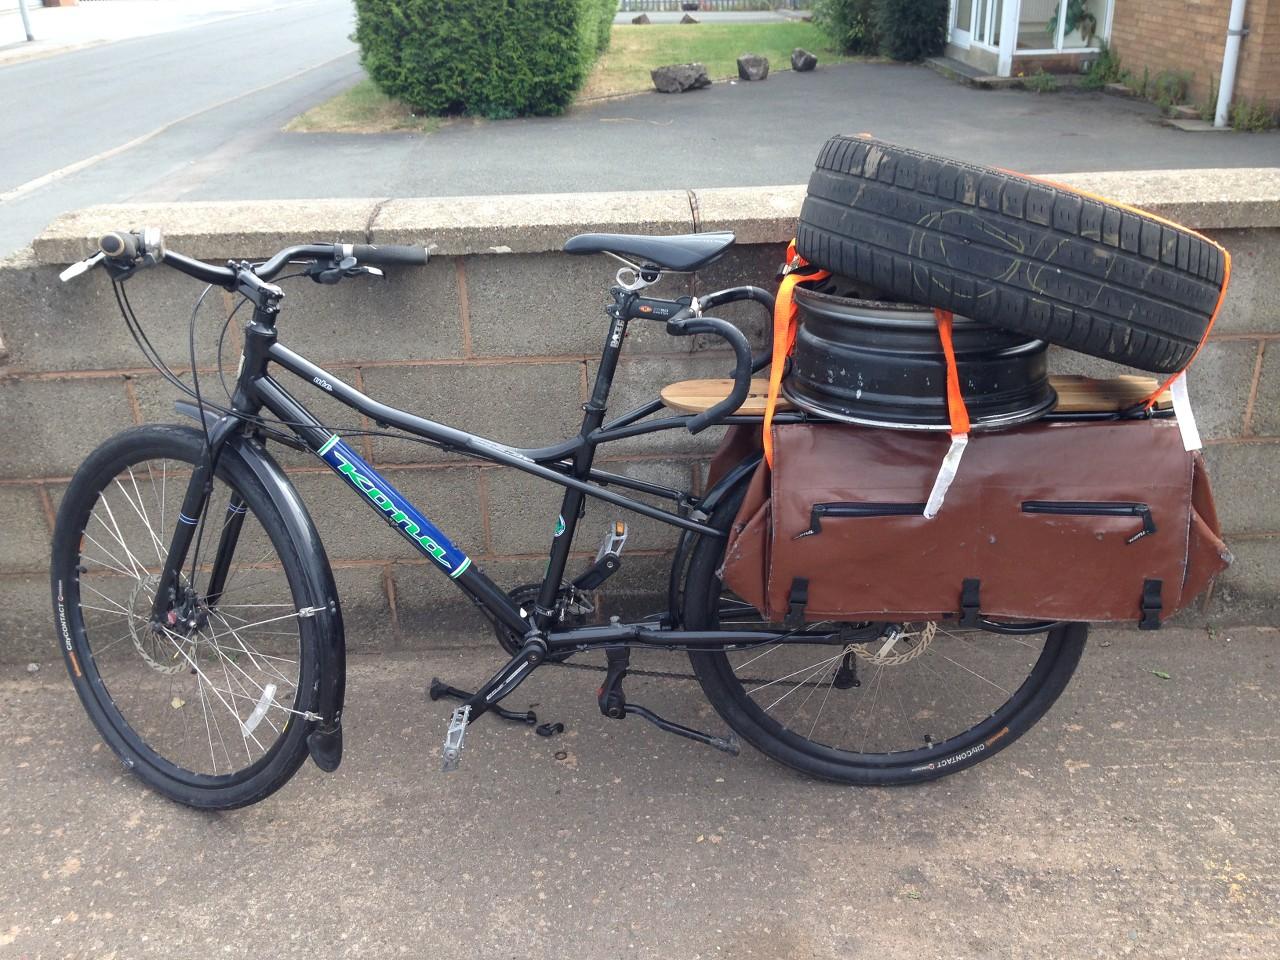 For Sale Kona Ute Medium Cargo Bike Singletrack Forum